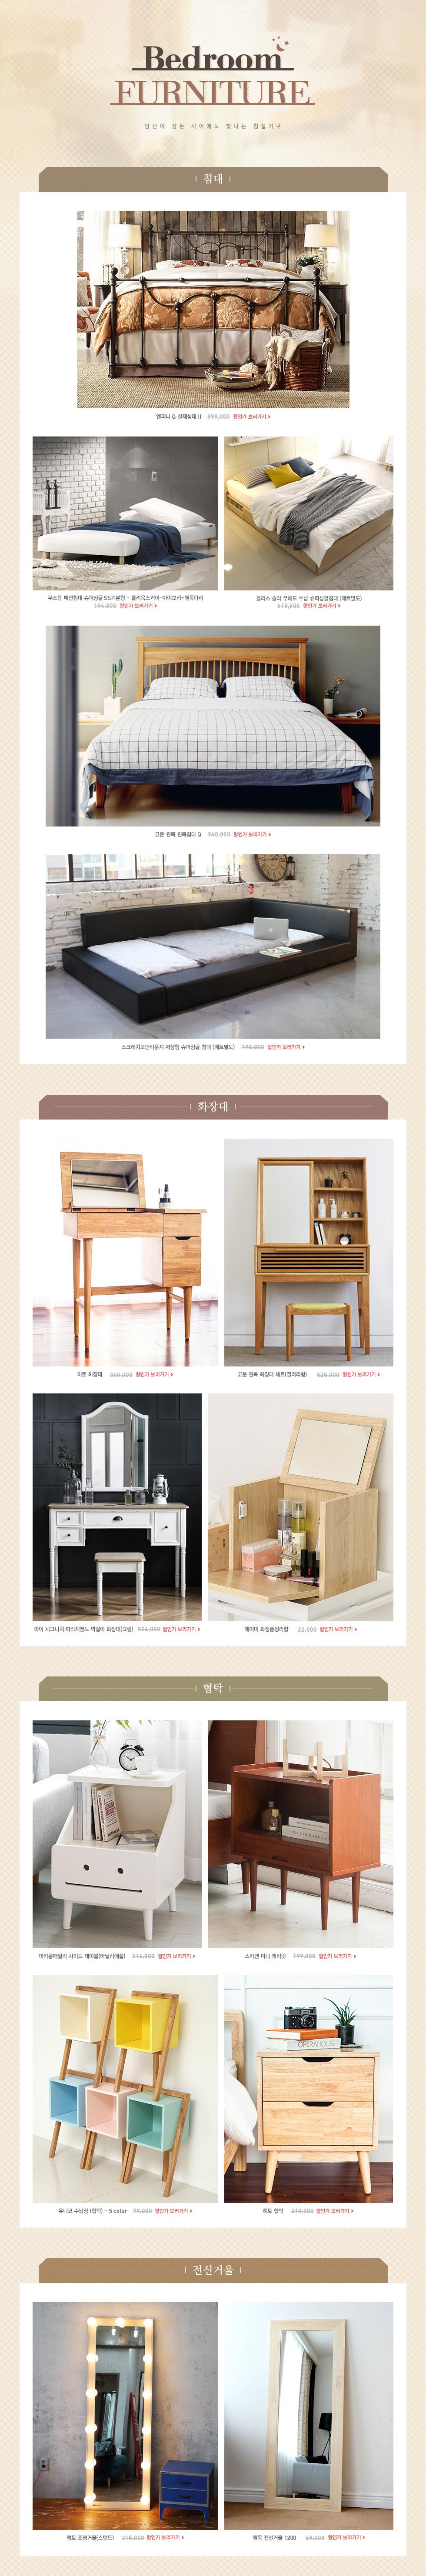 bedroom furniture - 이벤트 :: 천삼백케이